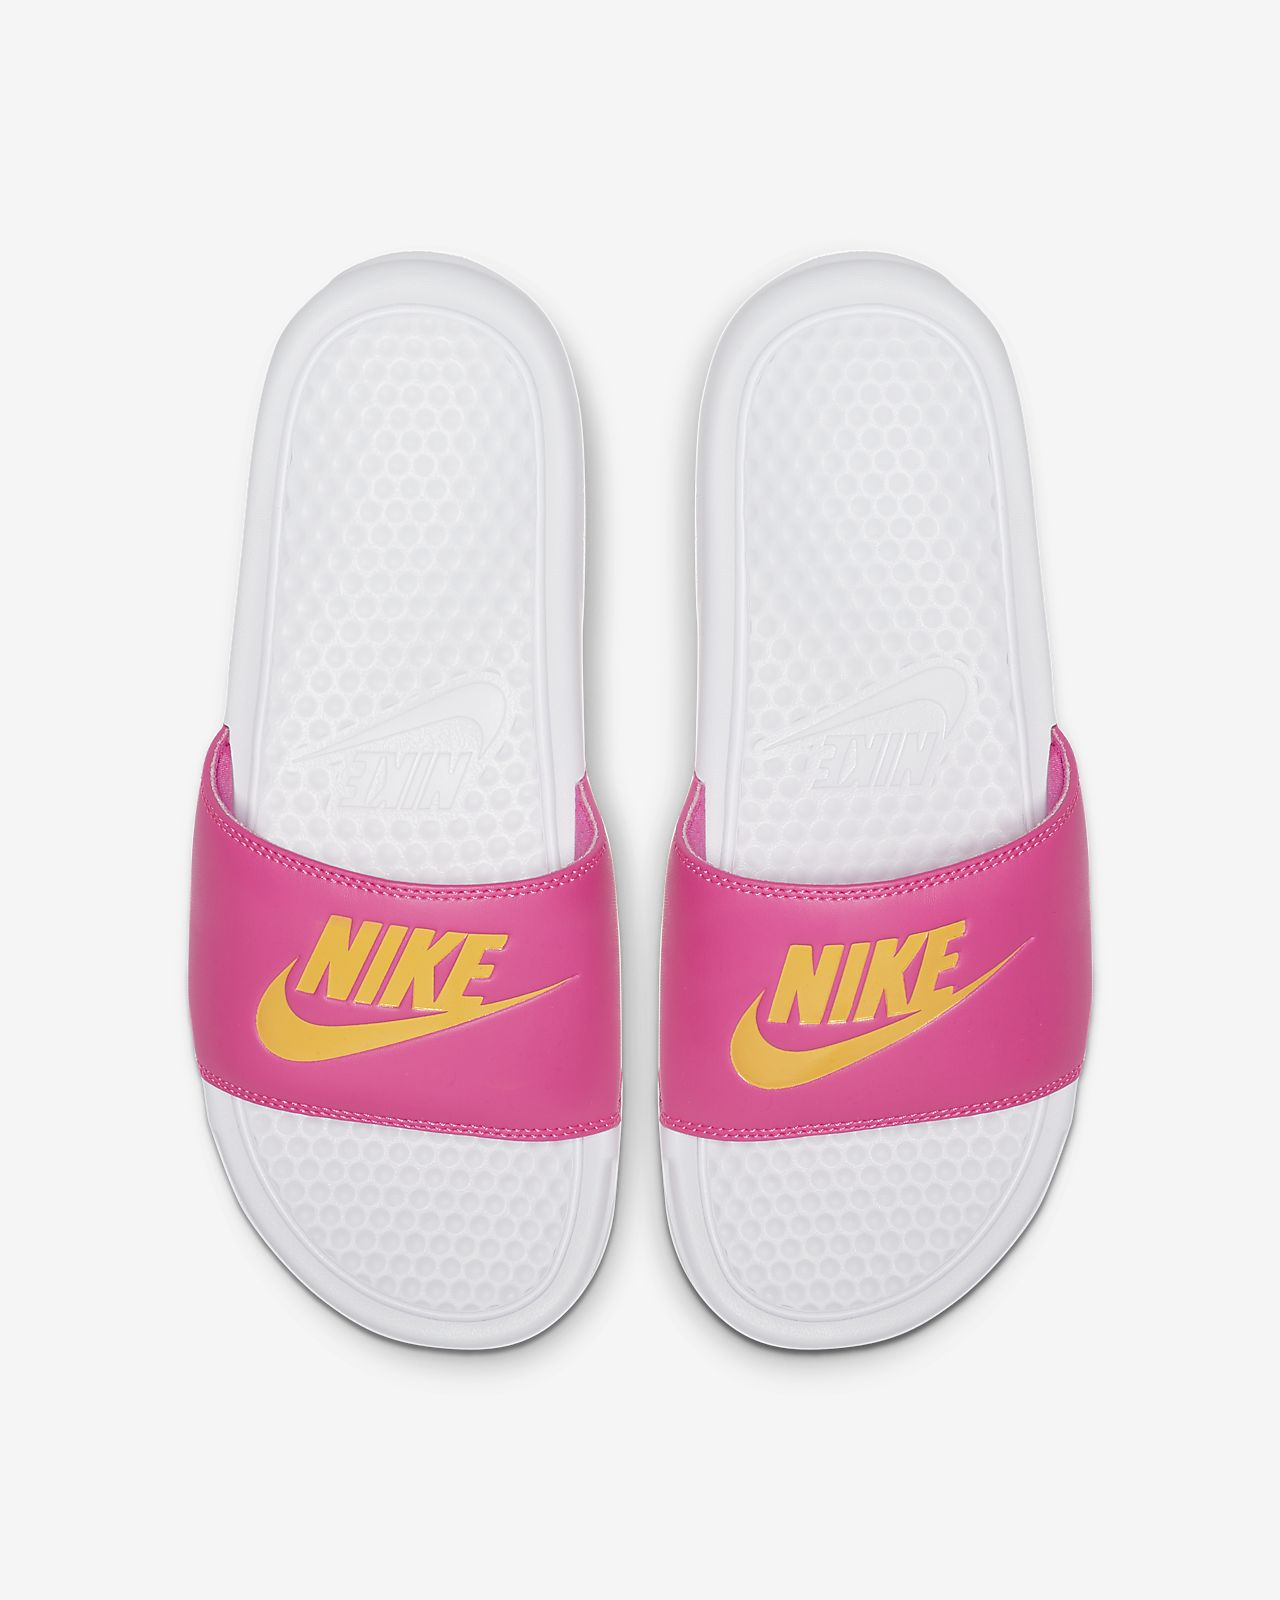 0964e6e9f008 Nike Benassi Women s Slide. Nike.com PT